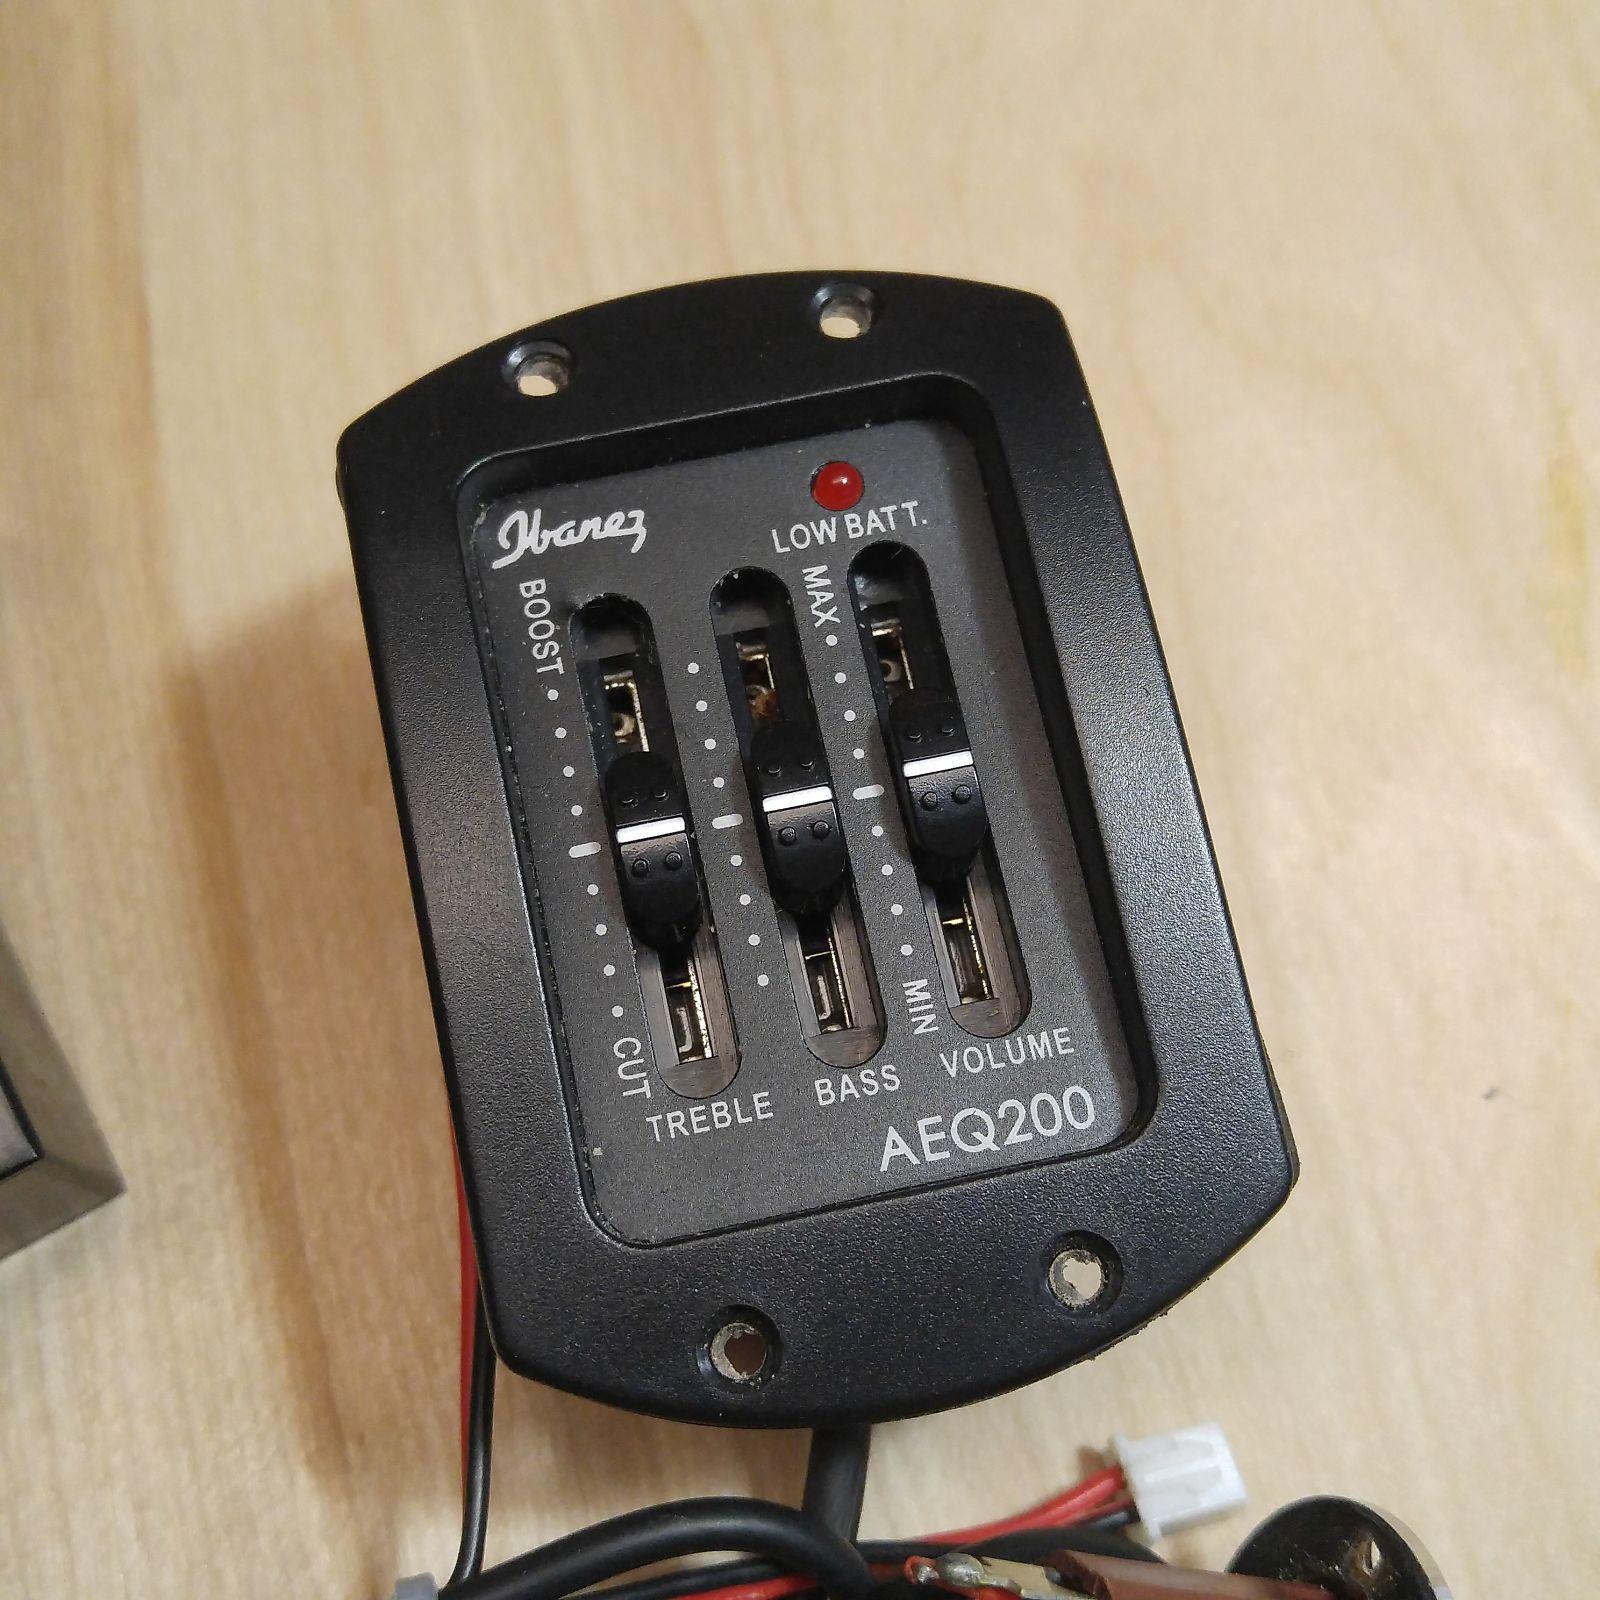 Surprising Ibanez Aeq200 Active Acoustic Preamp W Battery Box Piezo Wiring Cloud Usnesfoxcilixyz